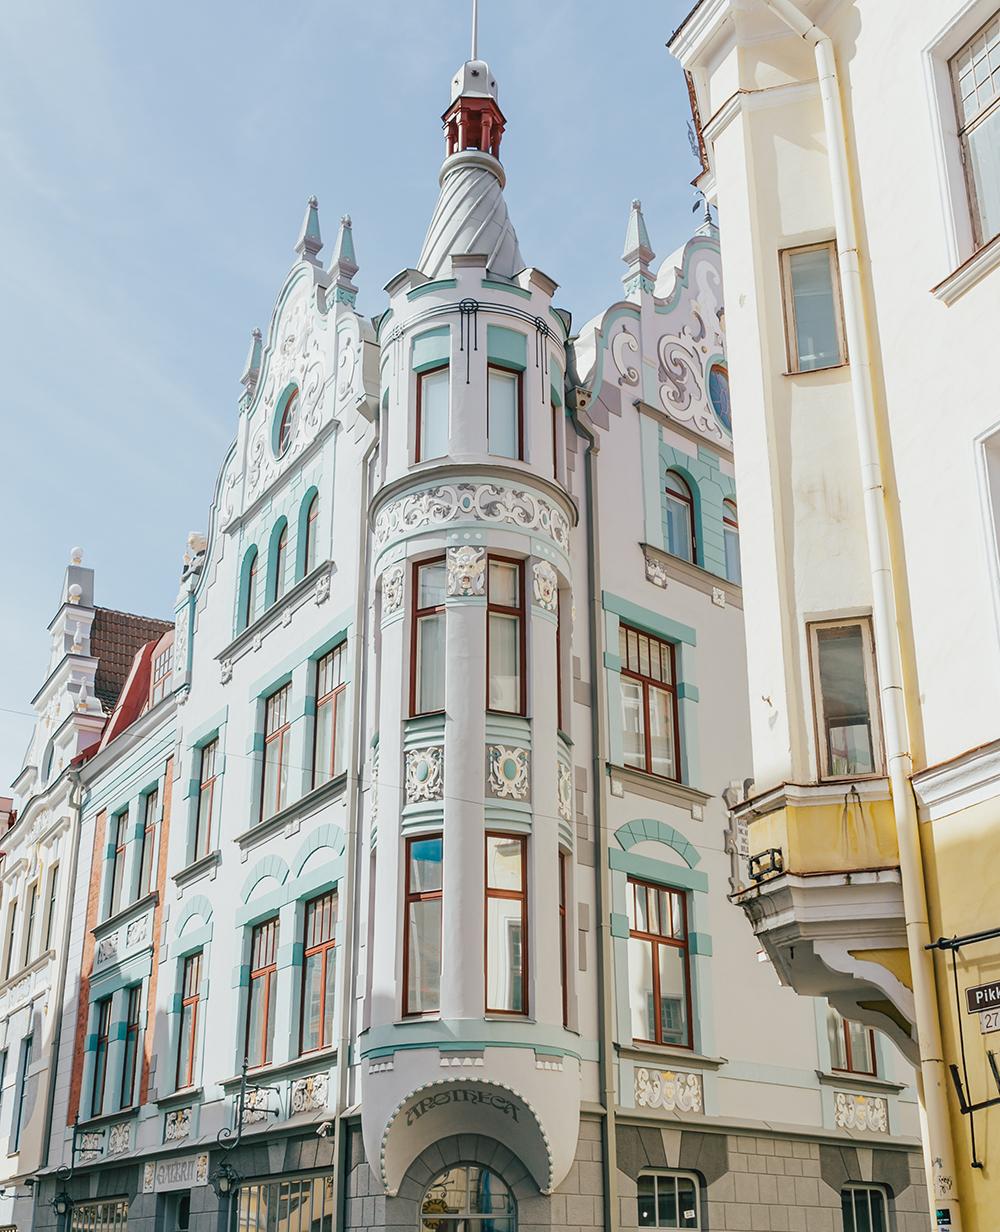 livvyland-blog-olivia-watson-fashion-travel-blogger-princess-cruises-scandinavia-northern-europe-what-to-do-wear-tallinn-estonia-3